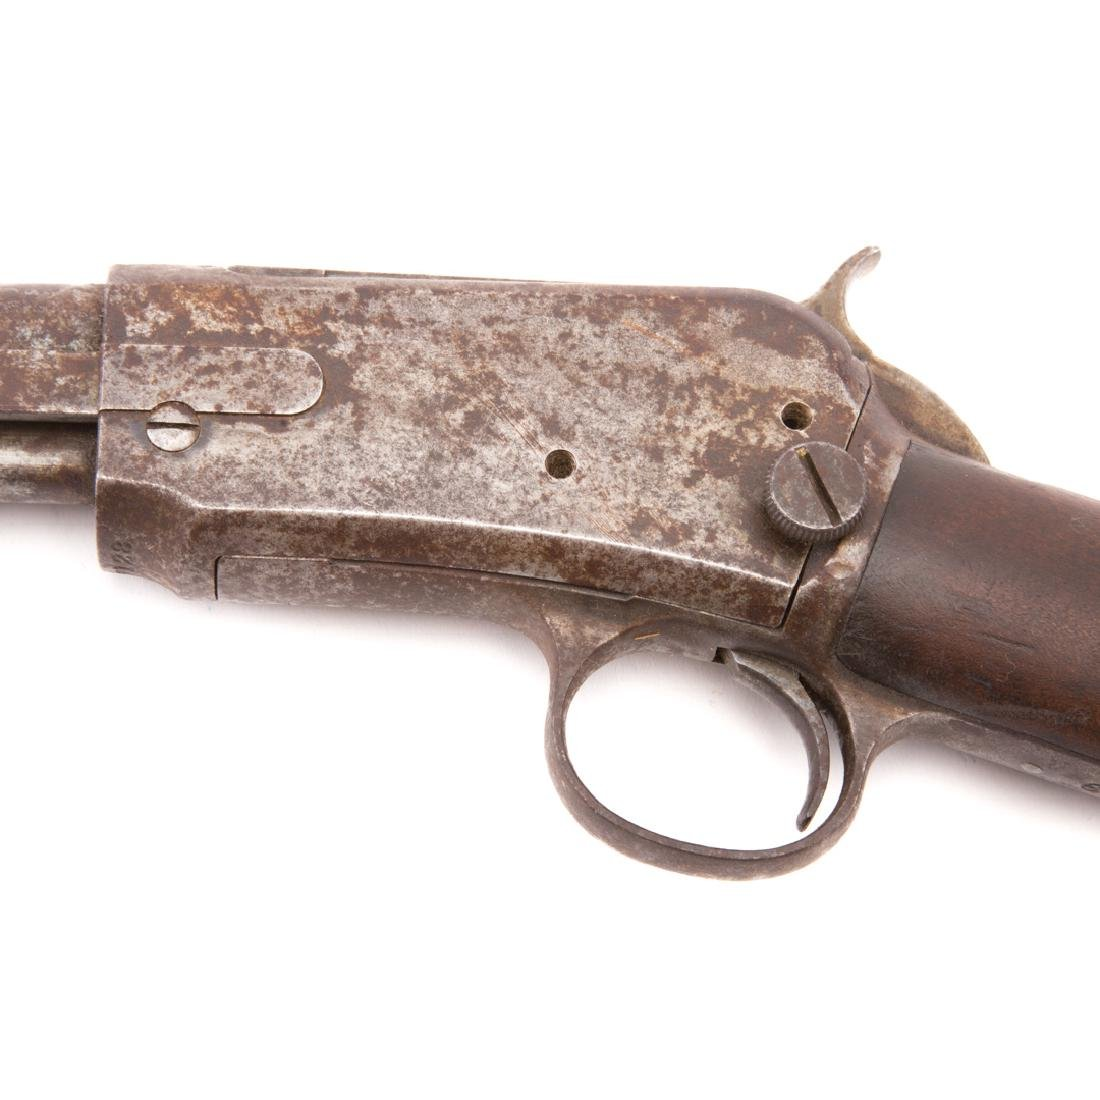 Winchester single shot 22 caliber - 4